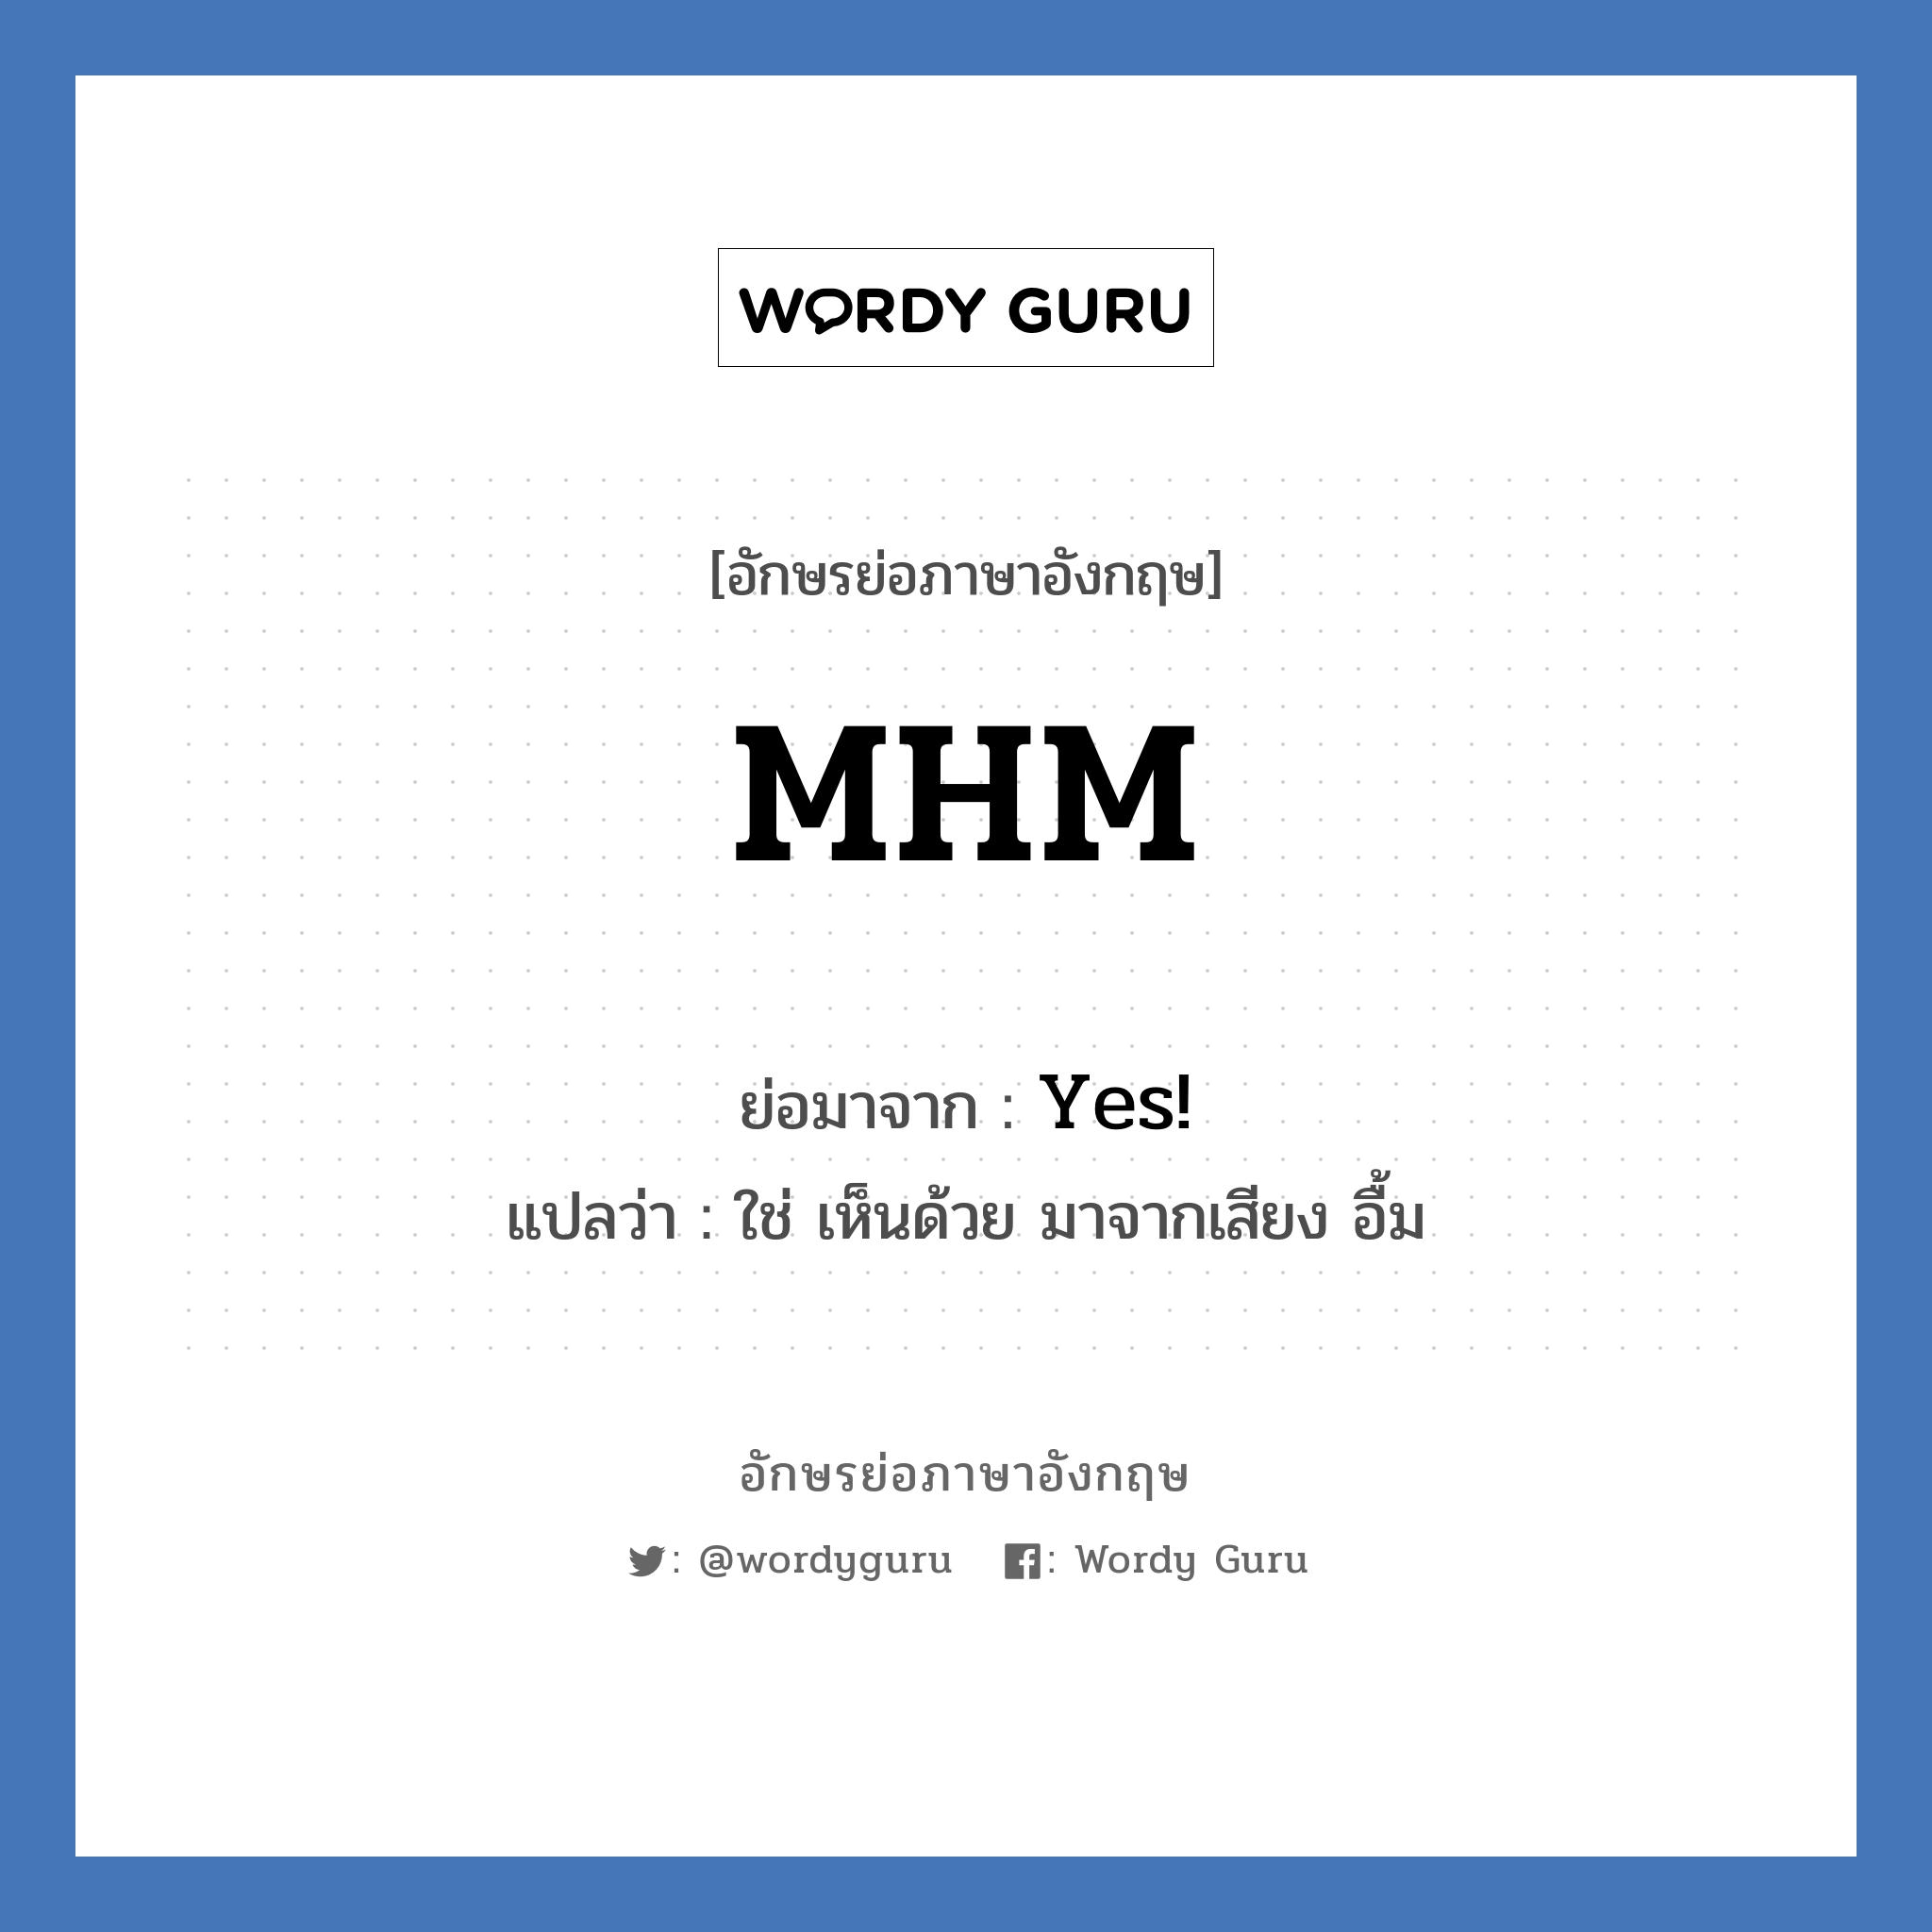 MHM ย่อมาจากอะไร - อักษรย่อภาษาอังกฤษ